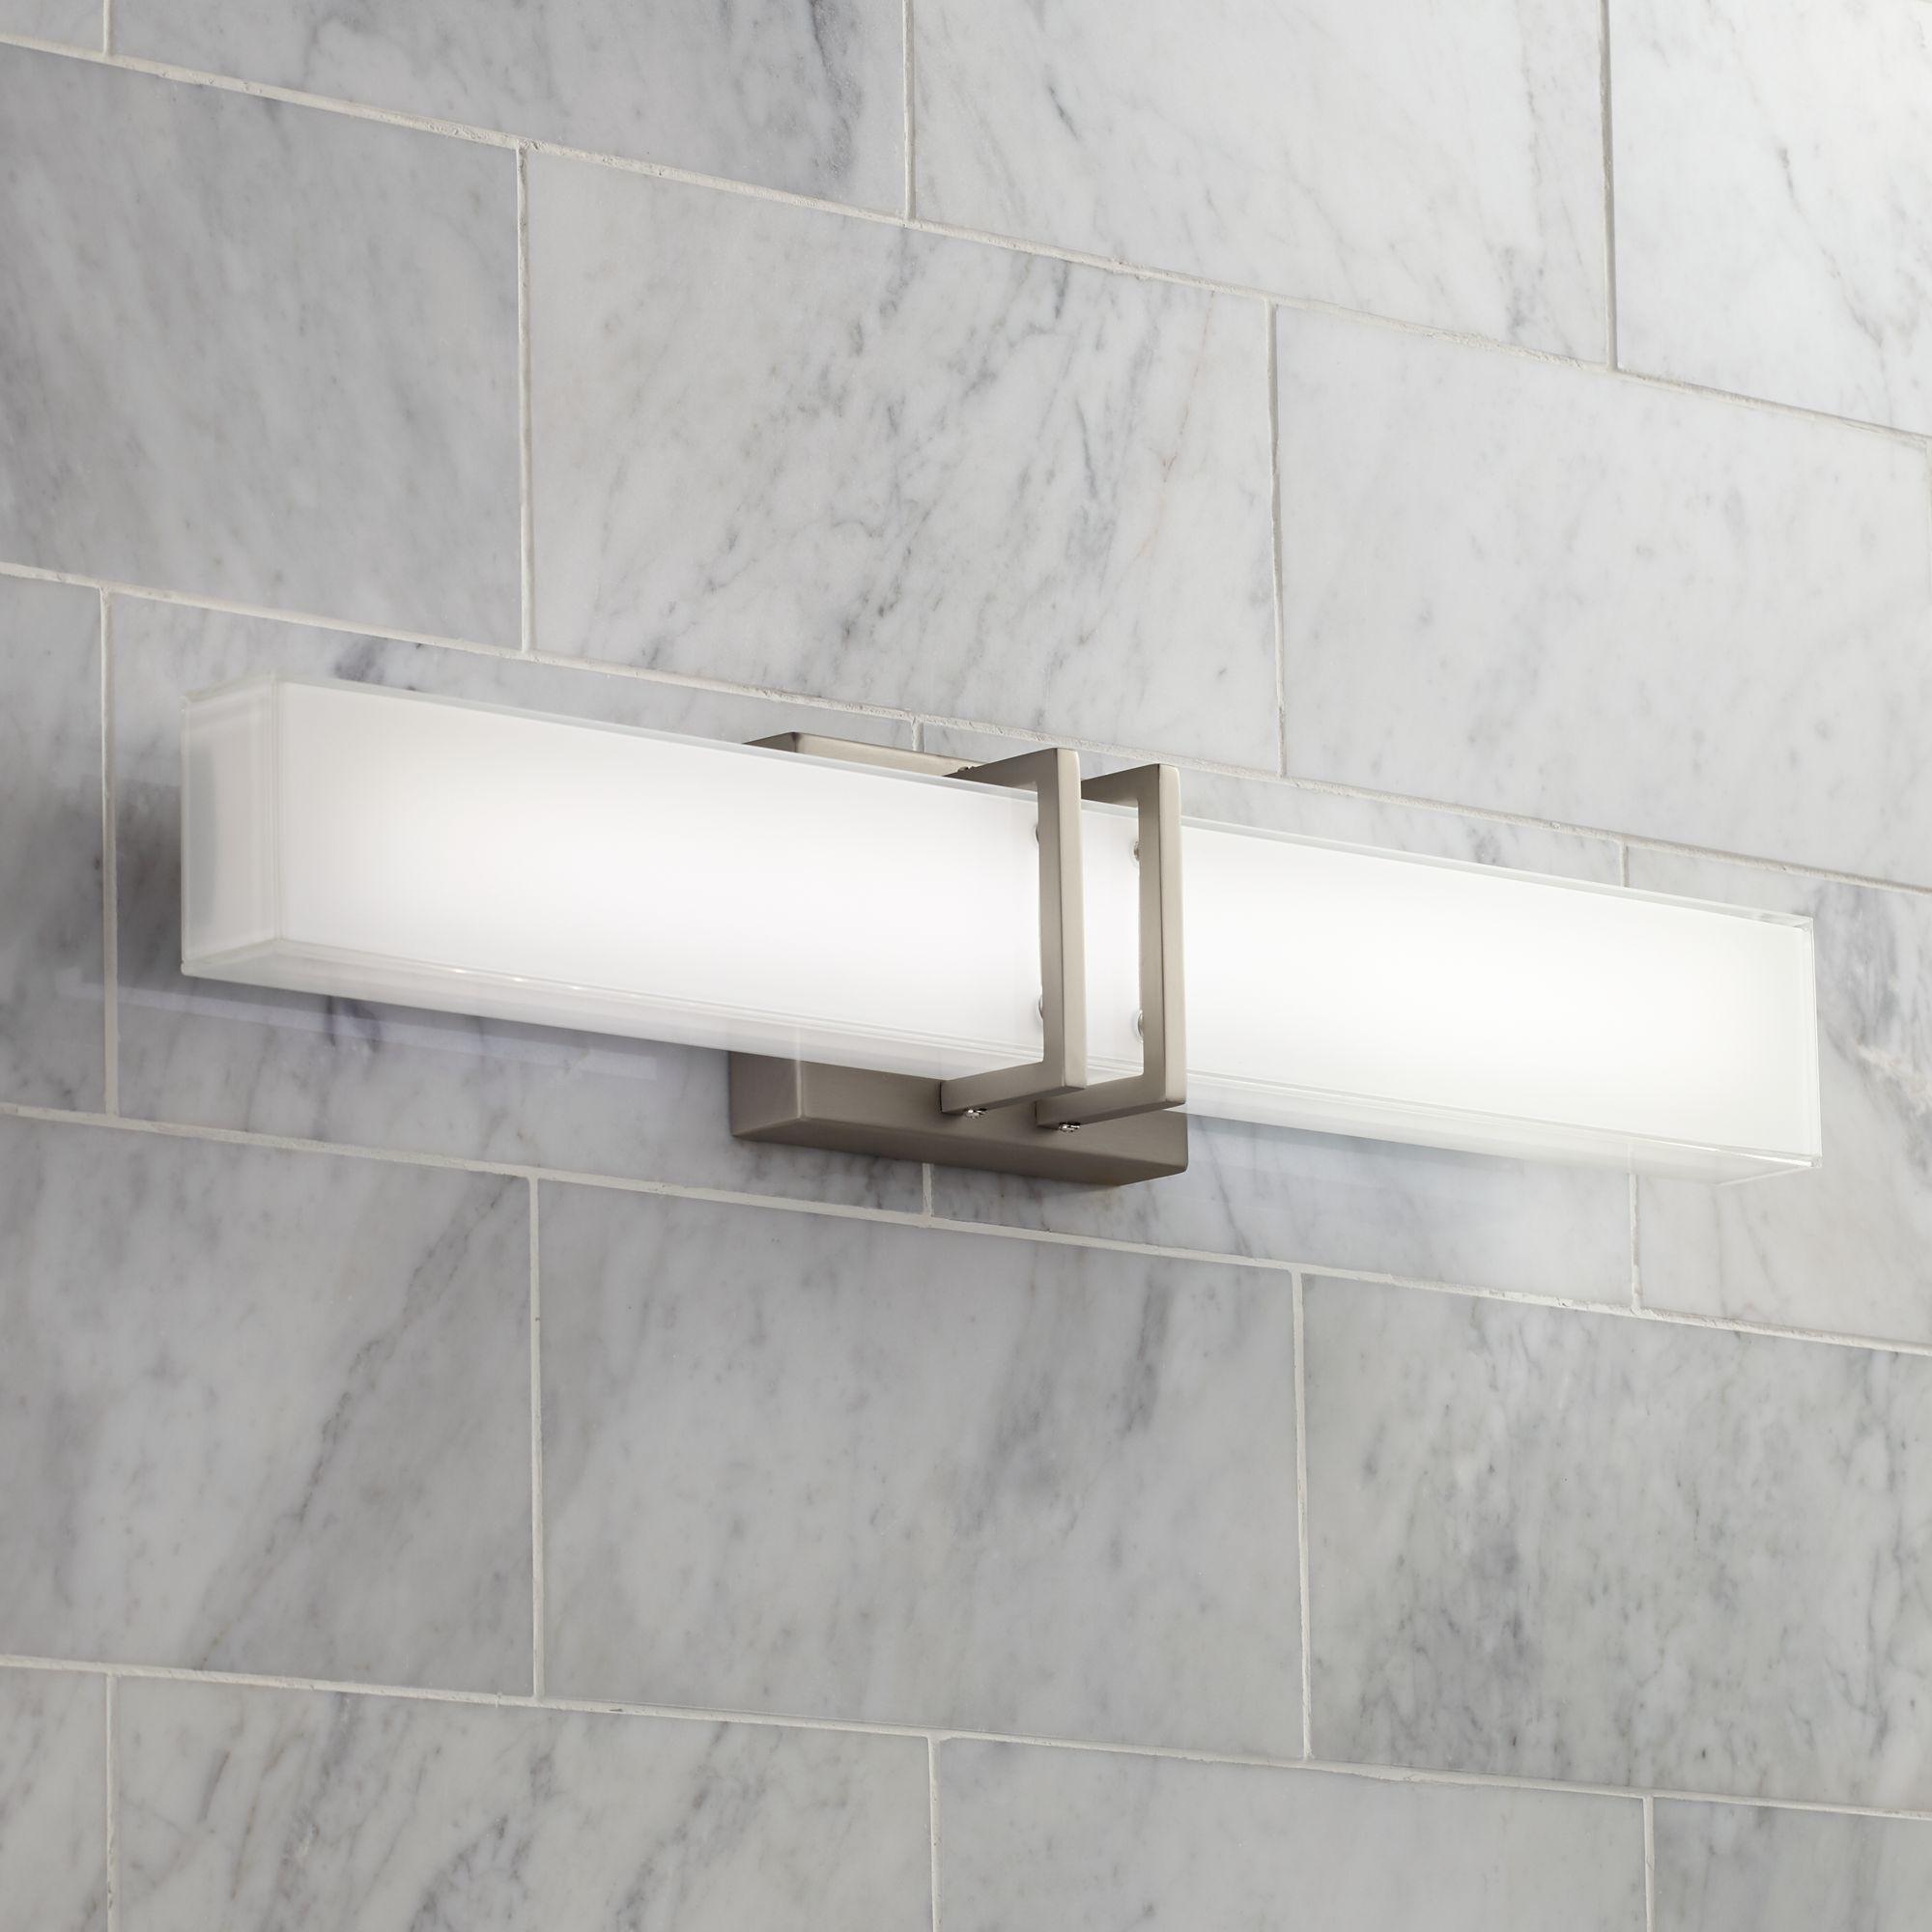 Led Bathroom Lighting possini euro exeter 24. possini euro exeter 24 EWIAIYQ